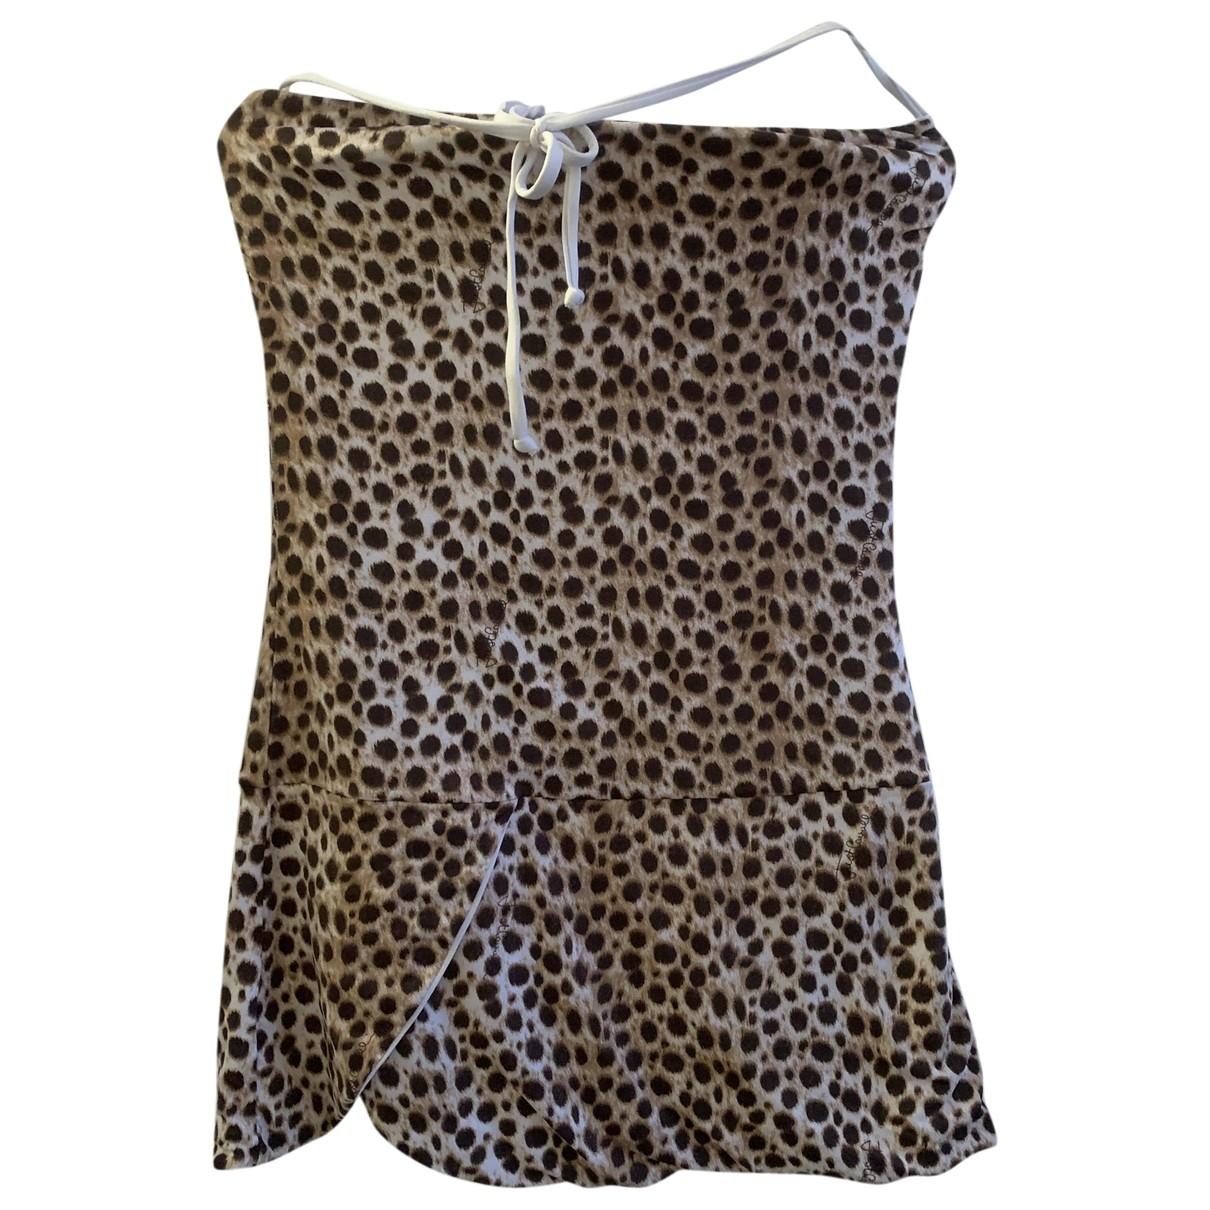 Just Cavalli \N dress for Women 38 IT